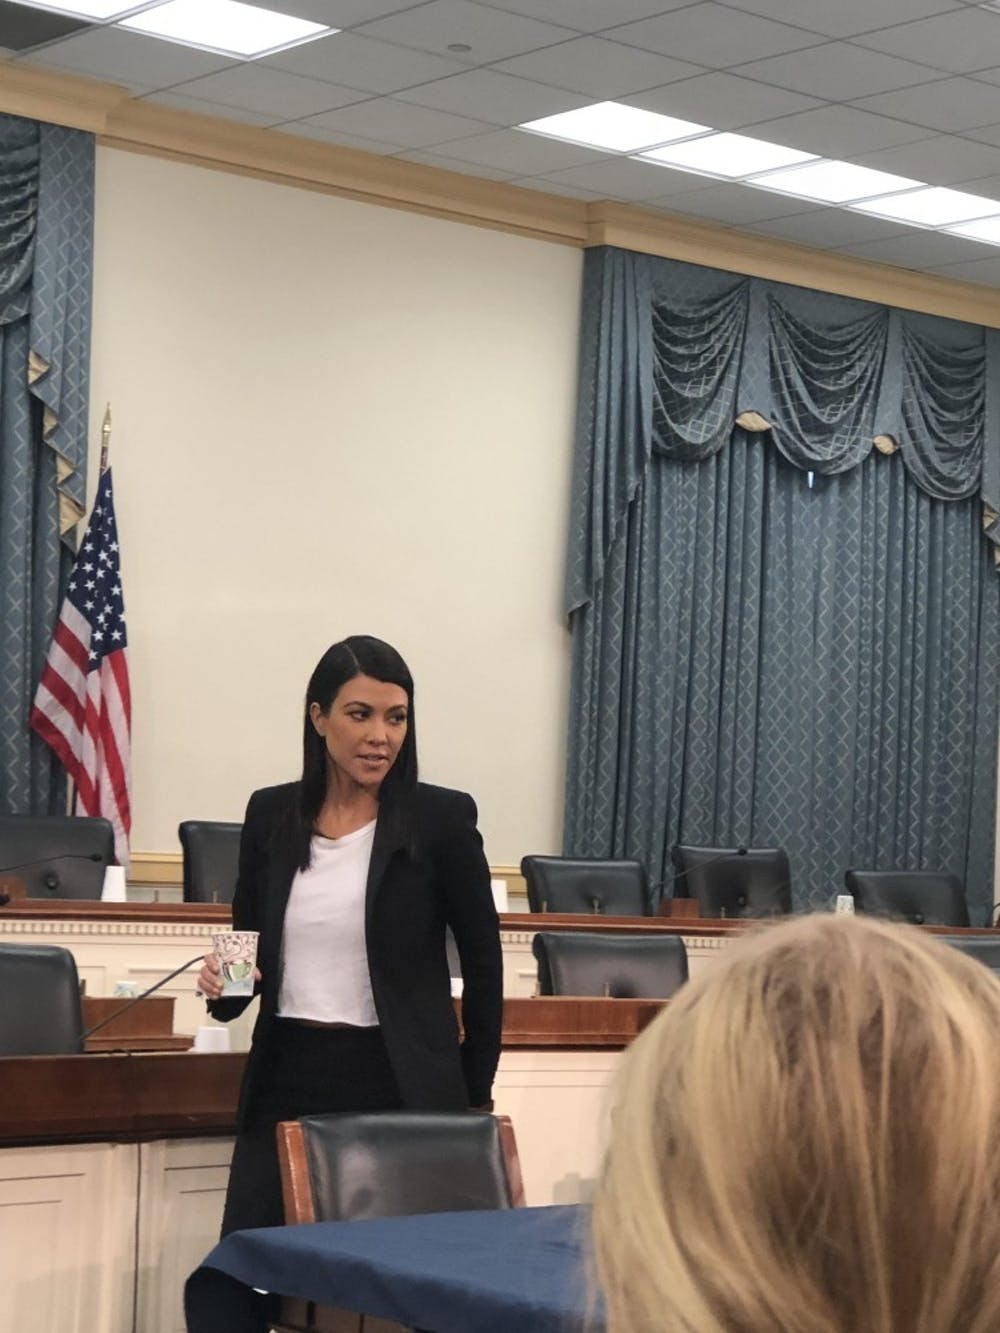 Kourtney Kardashian attends a briefing on Capitol Hall.